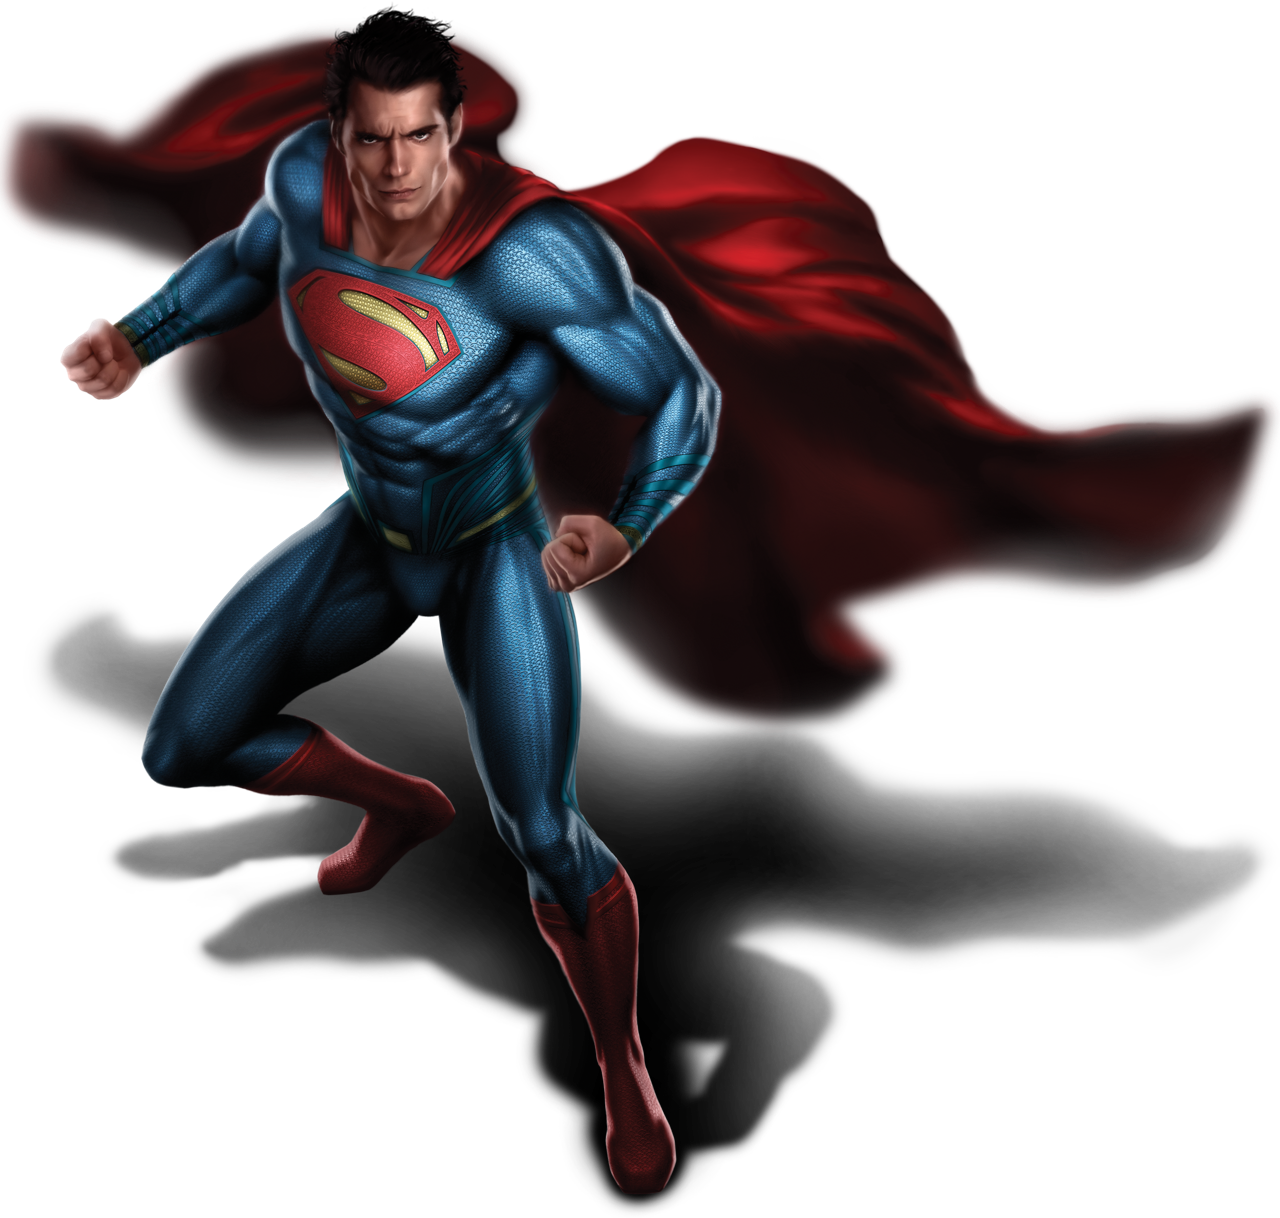 jpg royalty free stock transparent superman png file #117468677